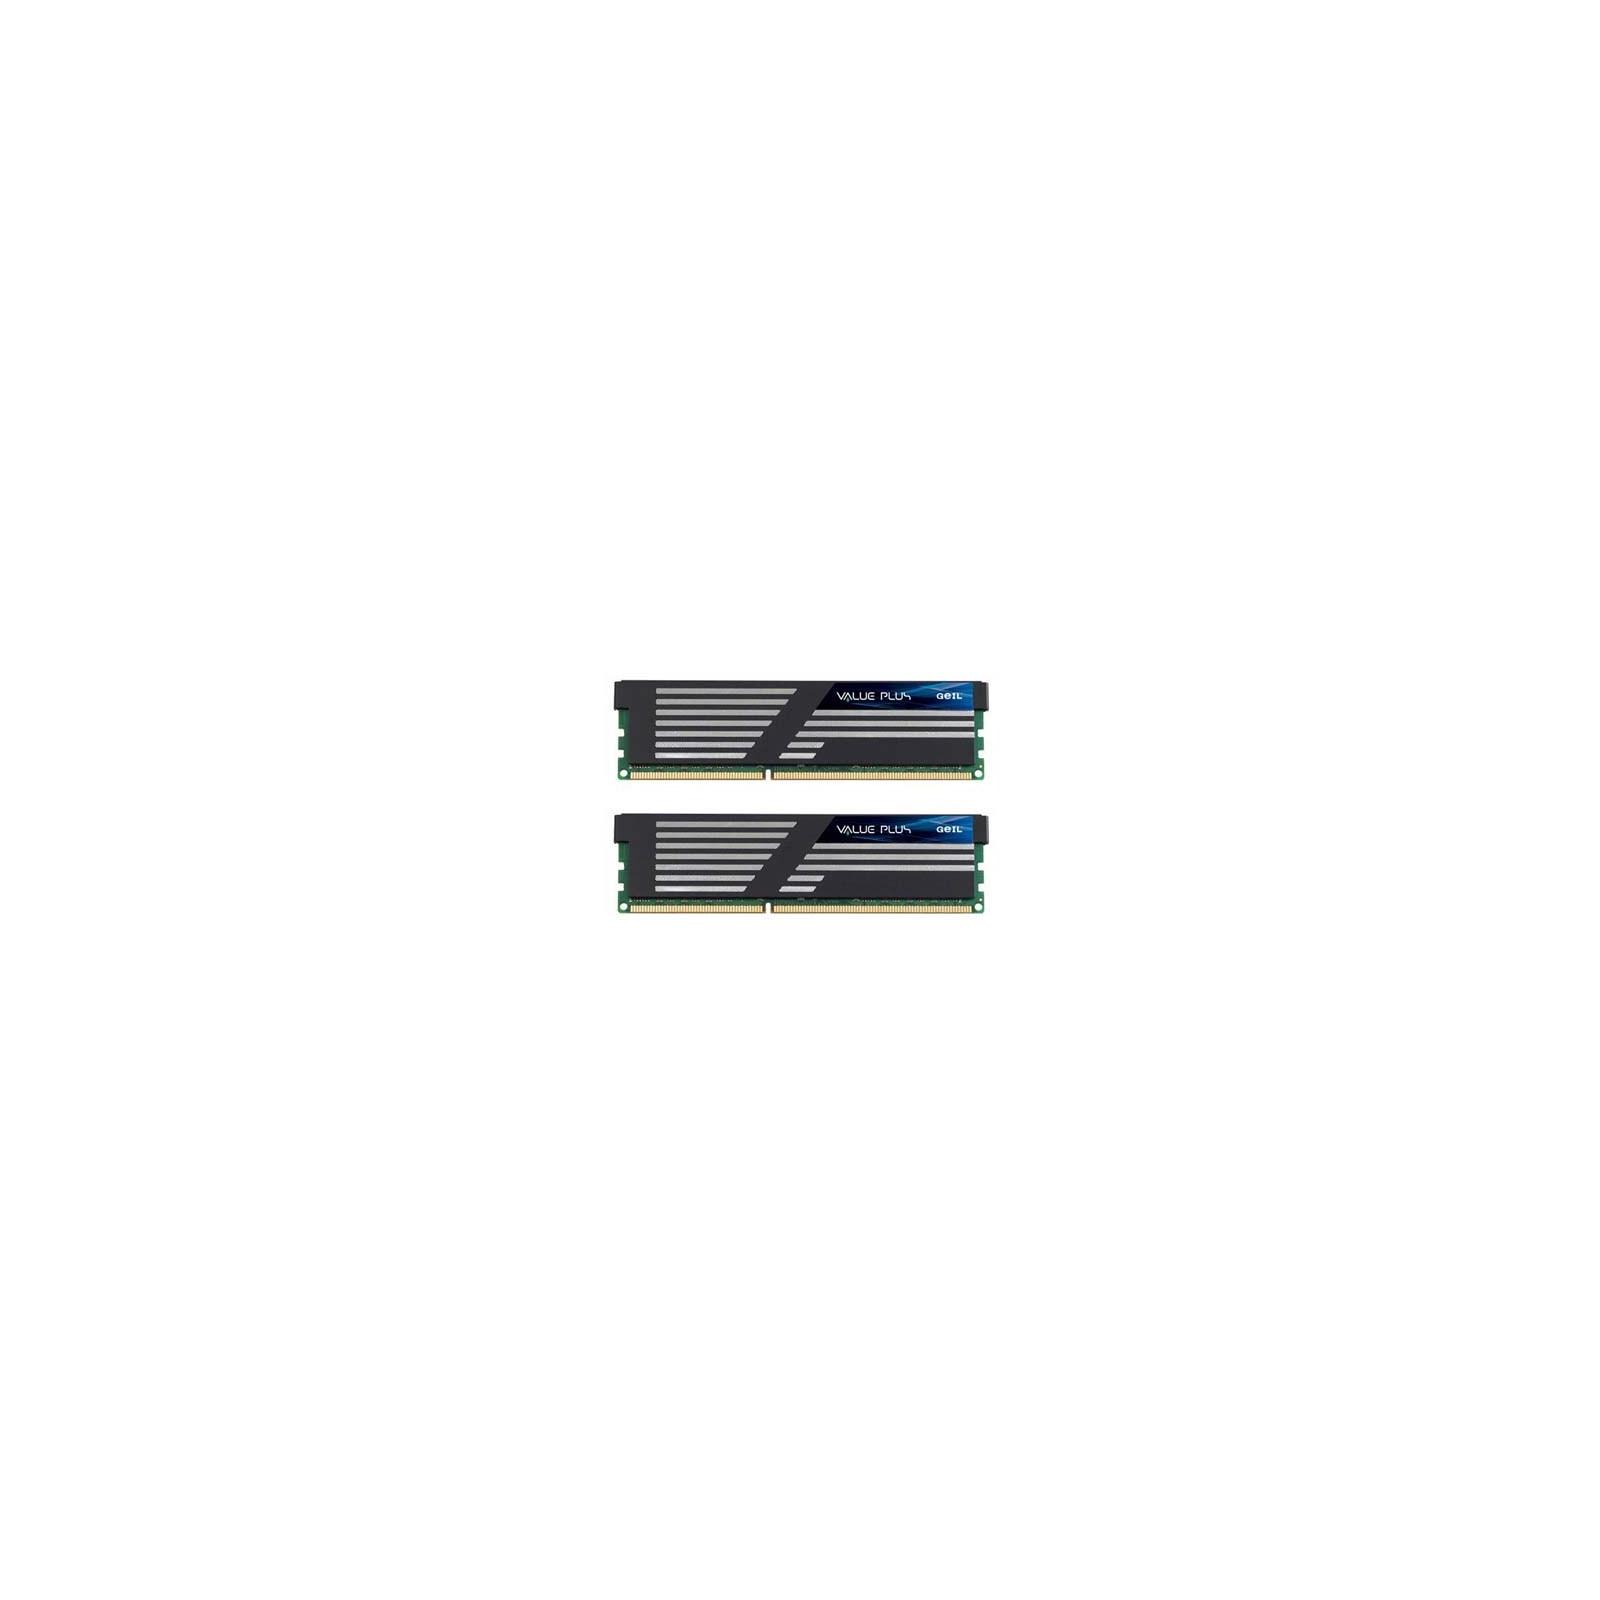 Модуль памяти для компьютера DDR3 8GB (2x4GB) 1333 MHz GEIL (GVP38GB1333C7DC)